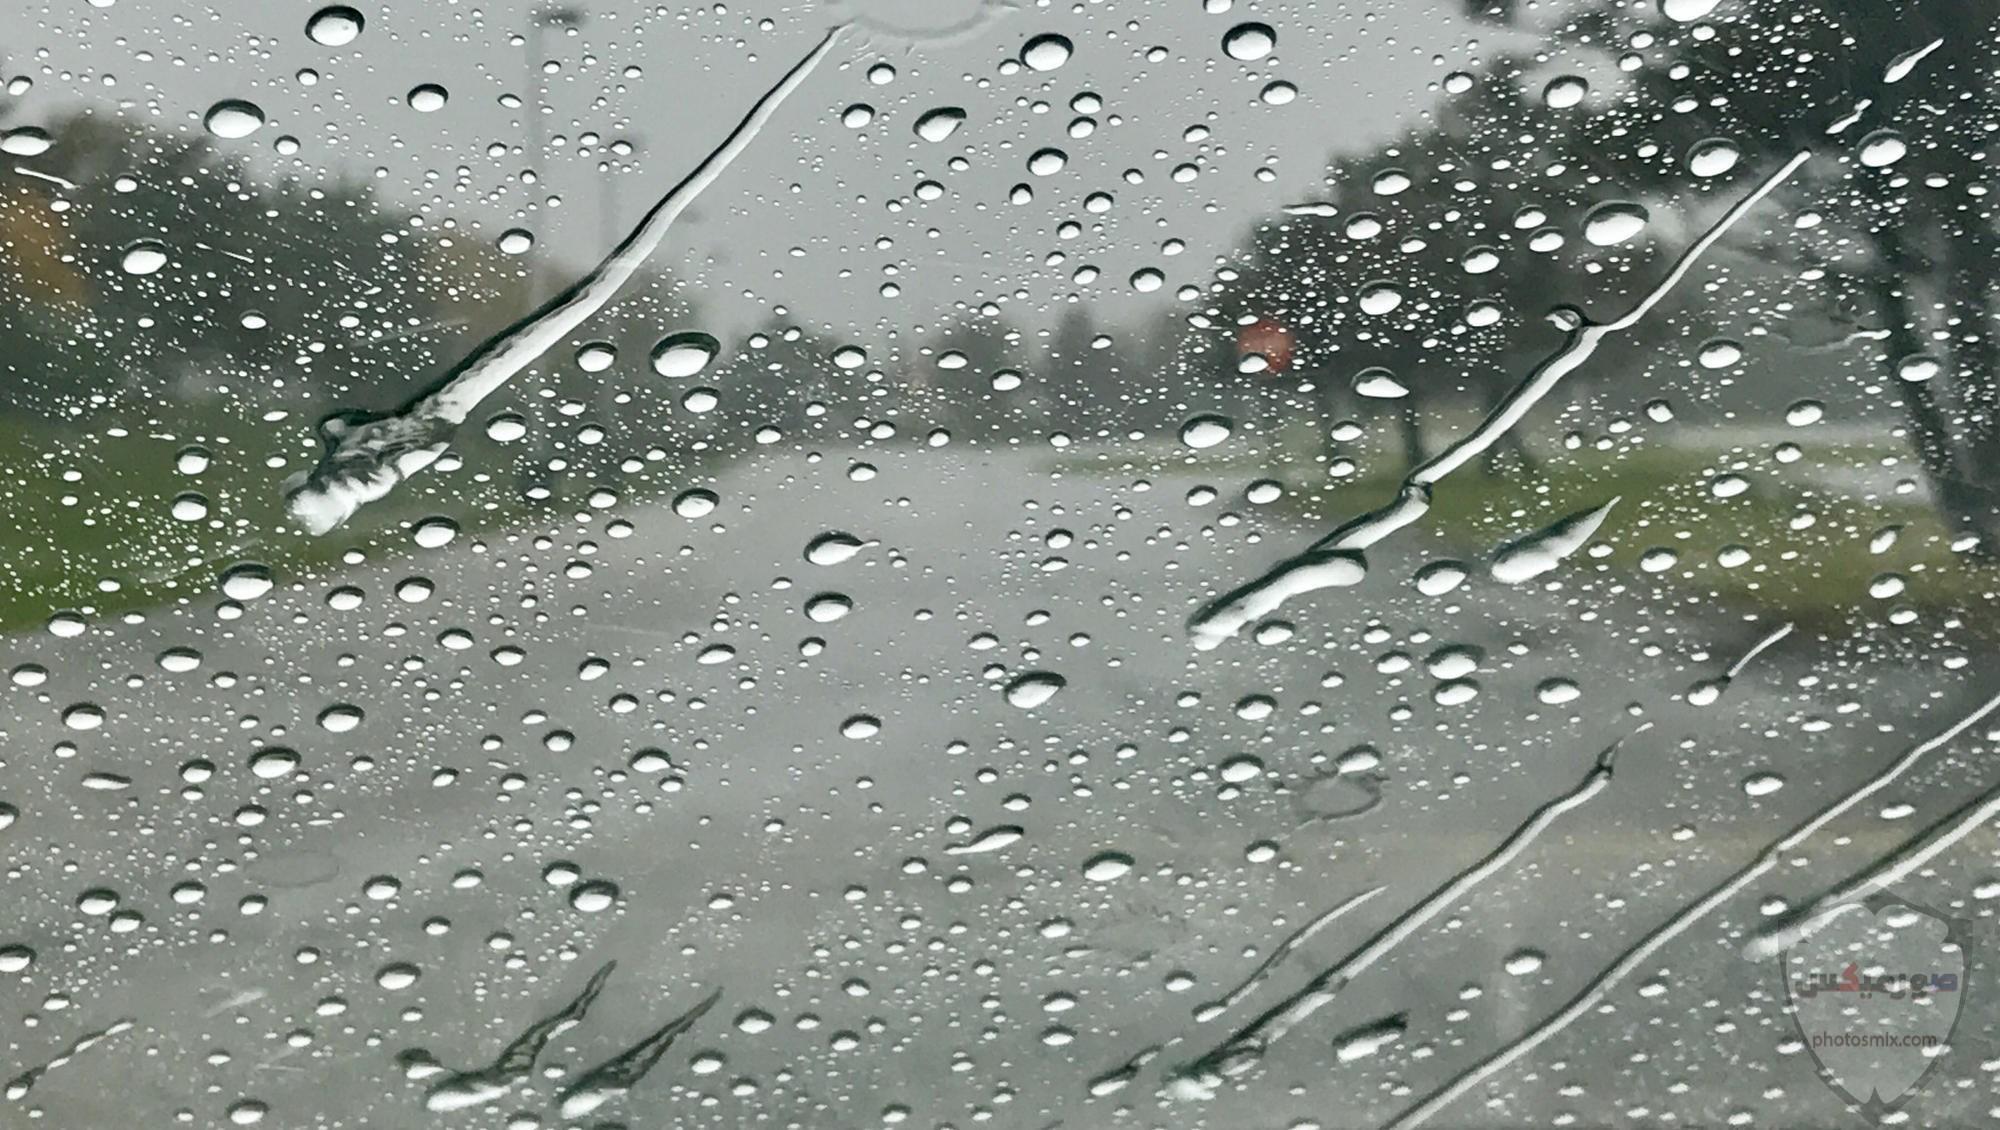 صور مطر جديدة 2020 photos rain خلفيات مطر 11 1